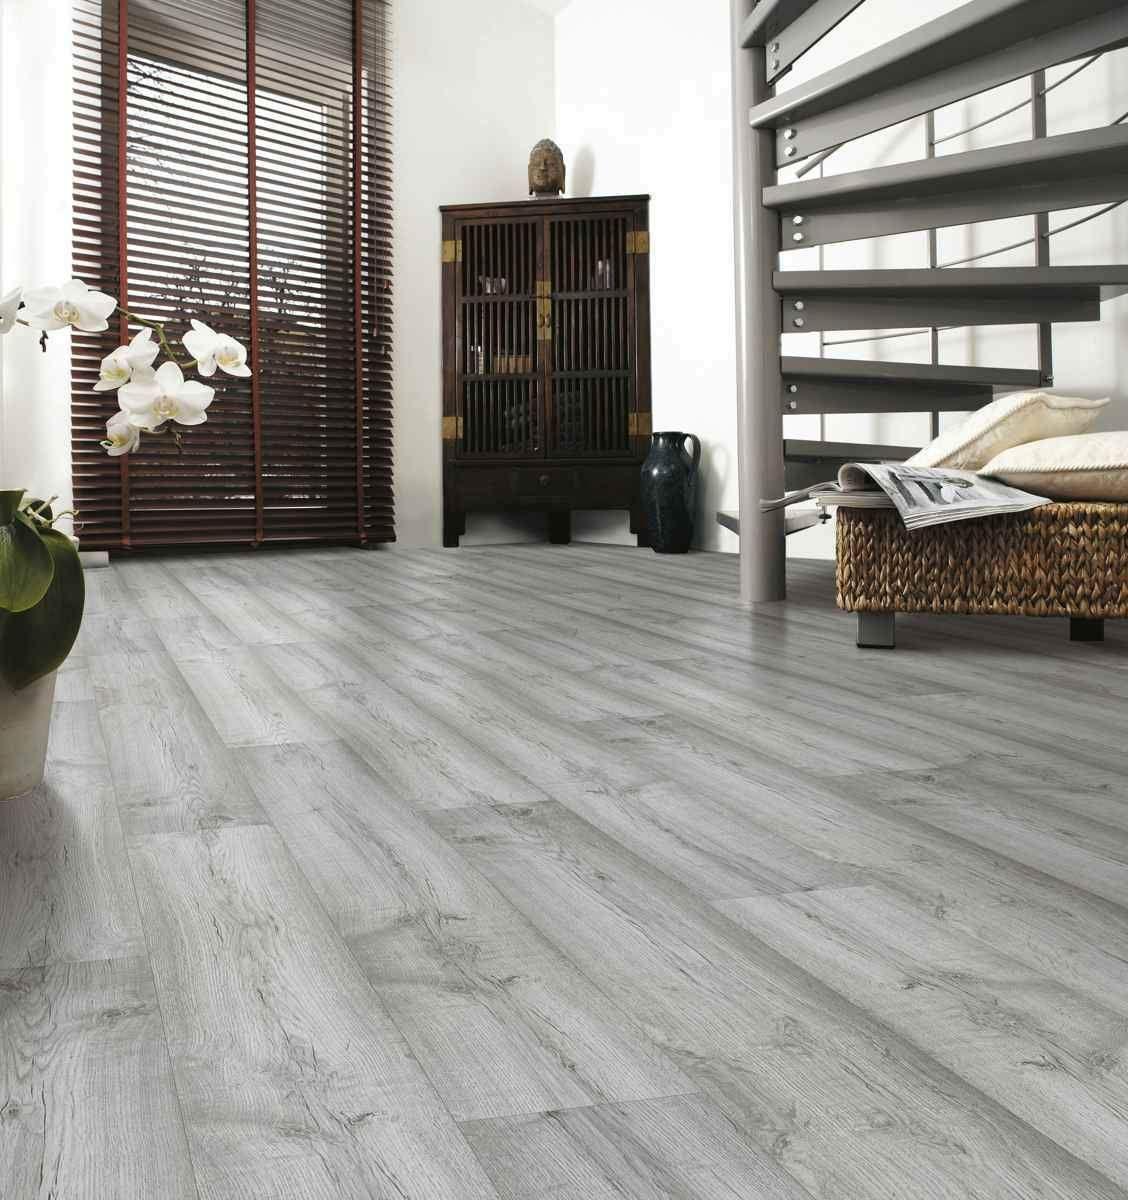 Kronospan Vario Plus Dartmoor Oak The Kronospan Vario Plus Dartmoor Oak Is A Stylish Classy Grey Lamina In 2020 Grey Laminate Flooring Flooring Laminate Flooring